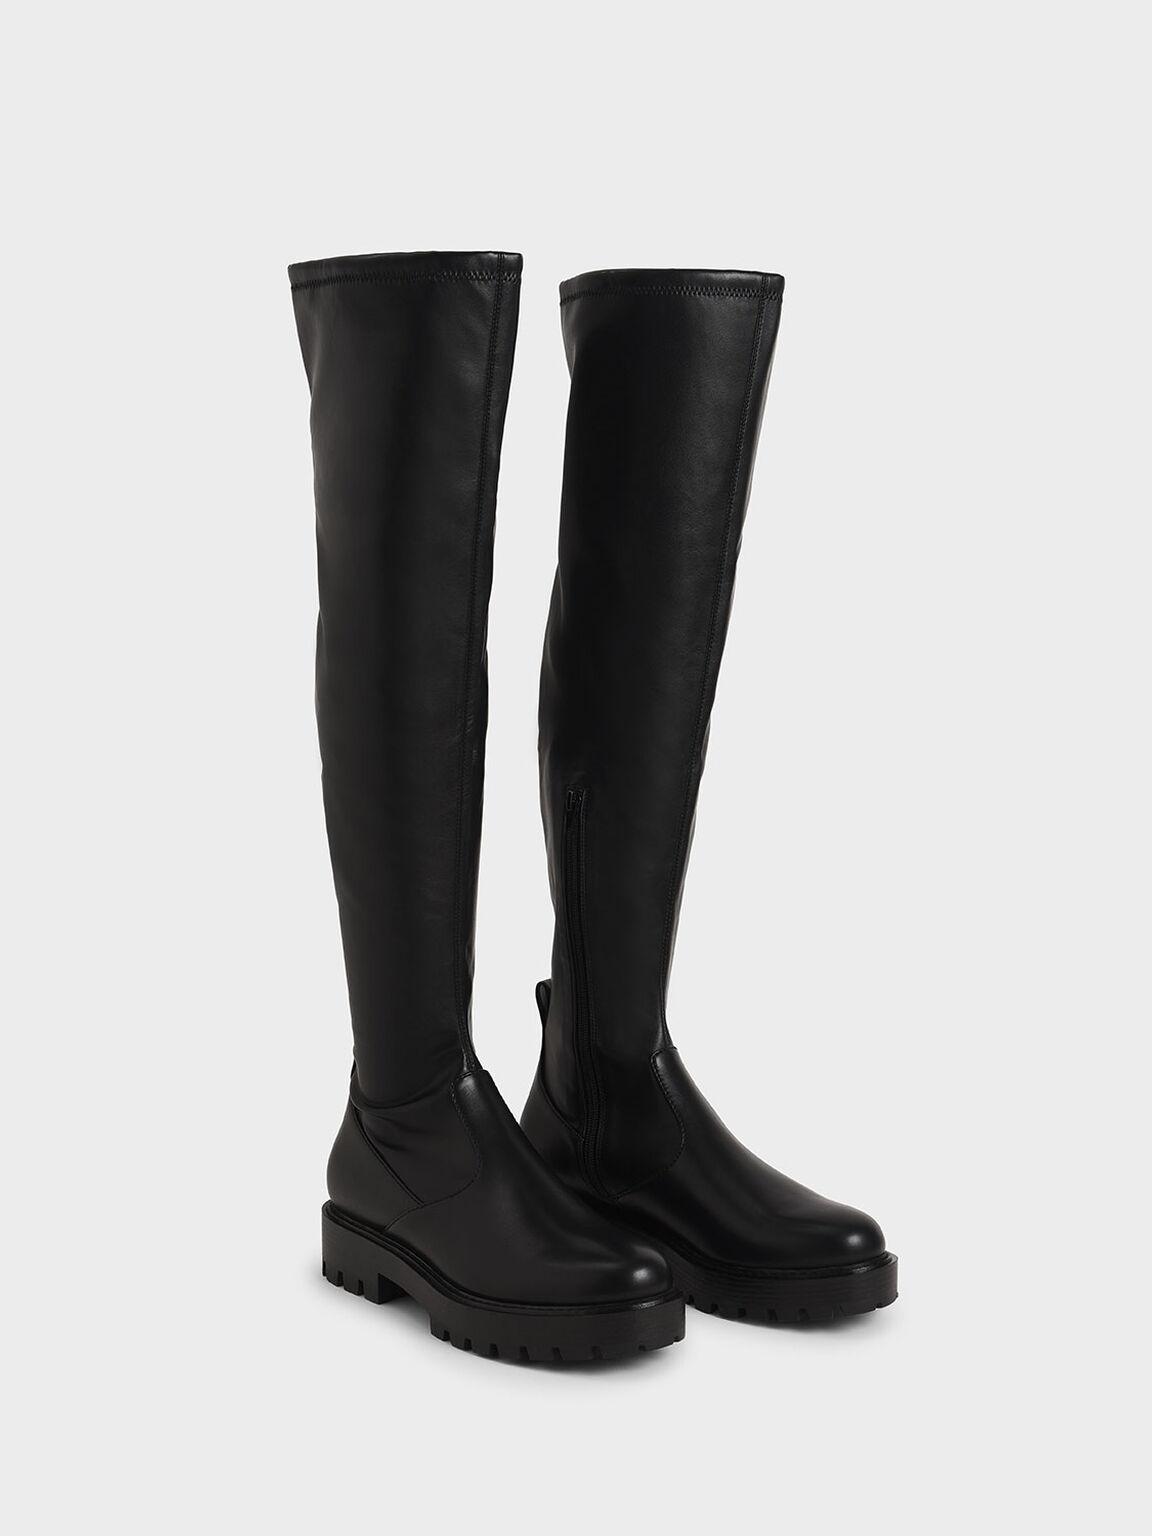 Thigh High Platform Boots, Black, hi-res